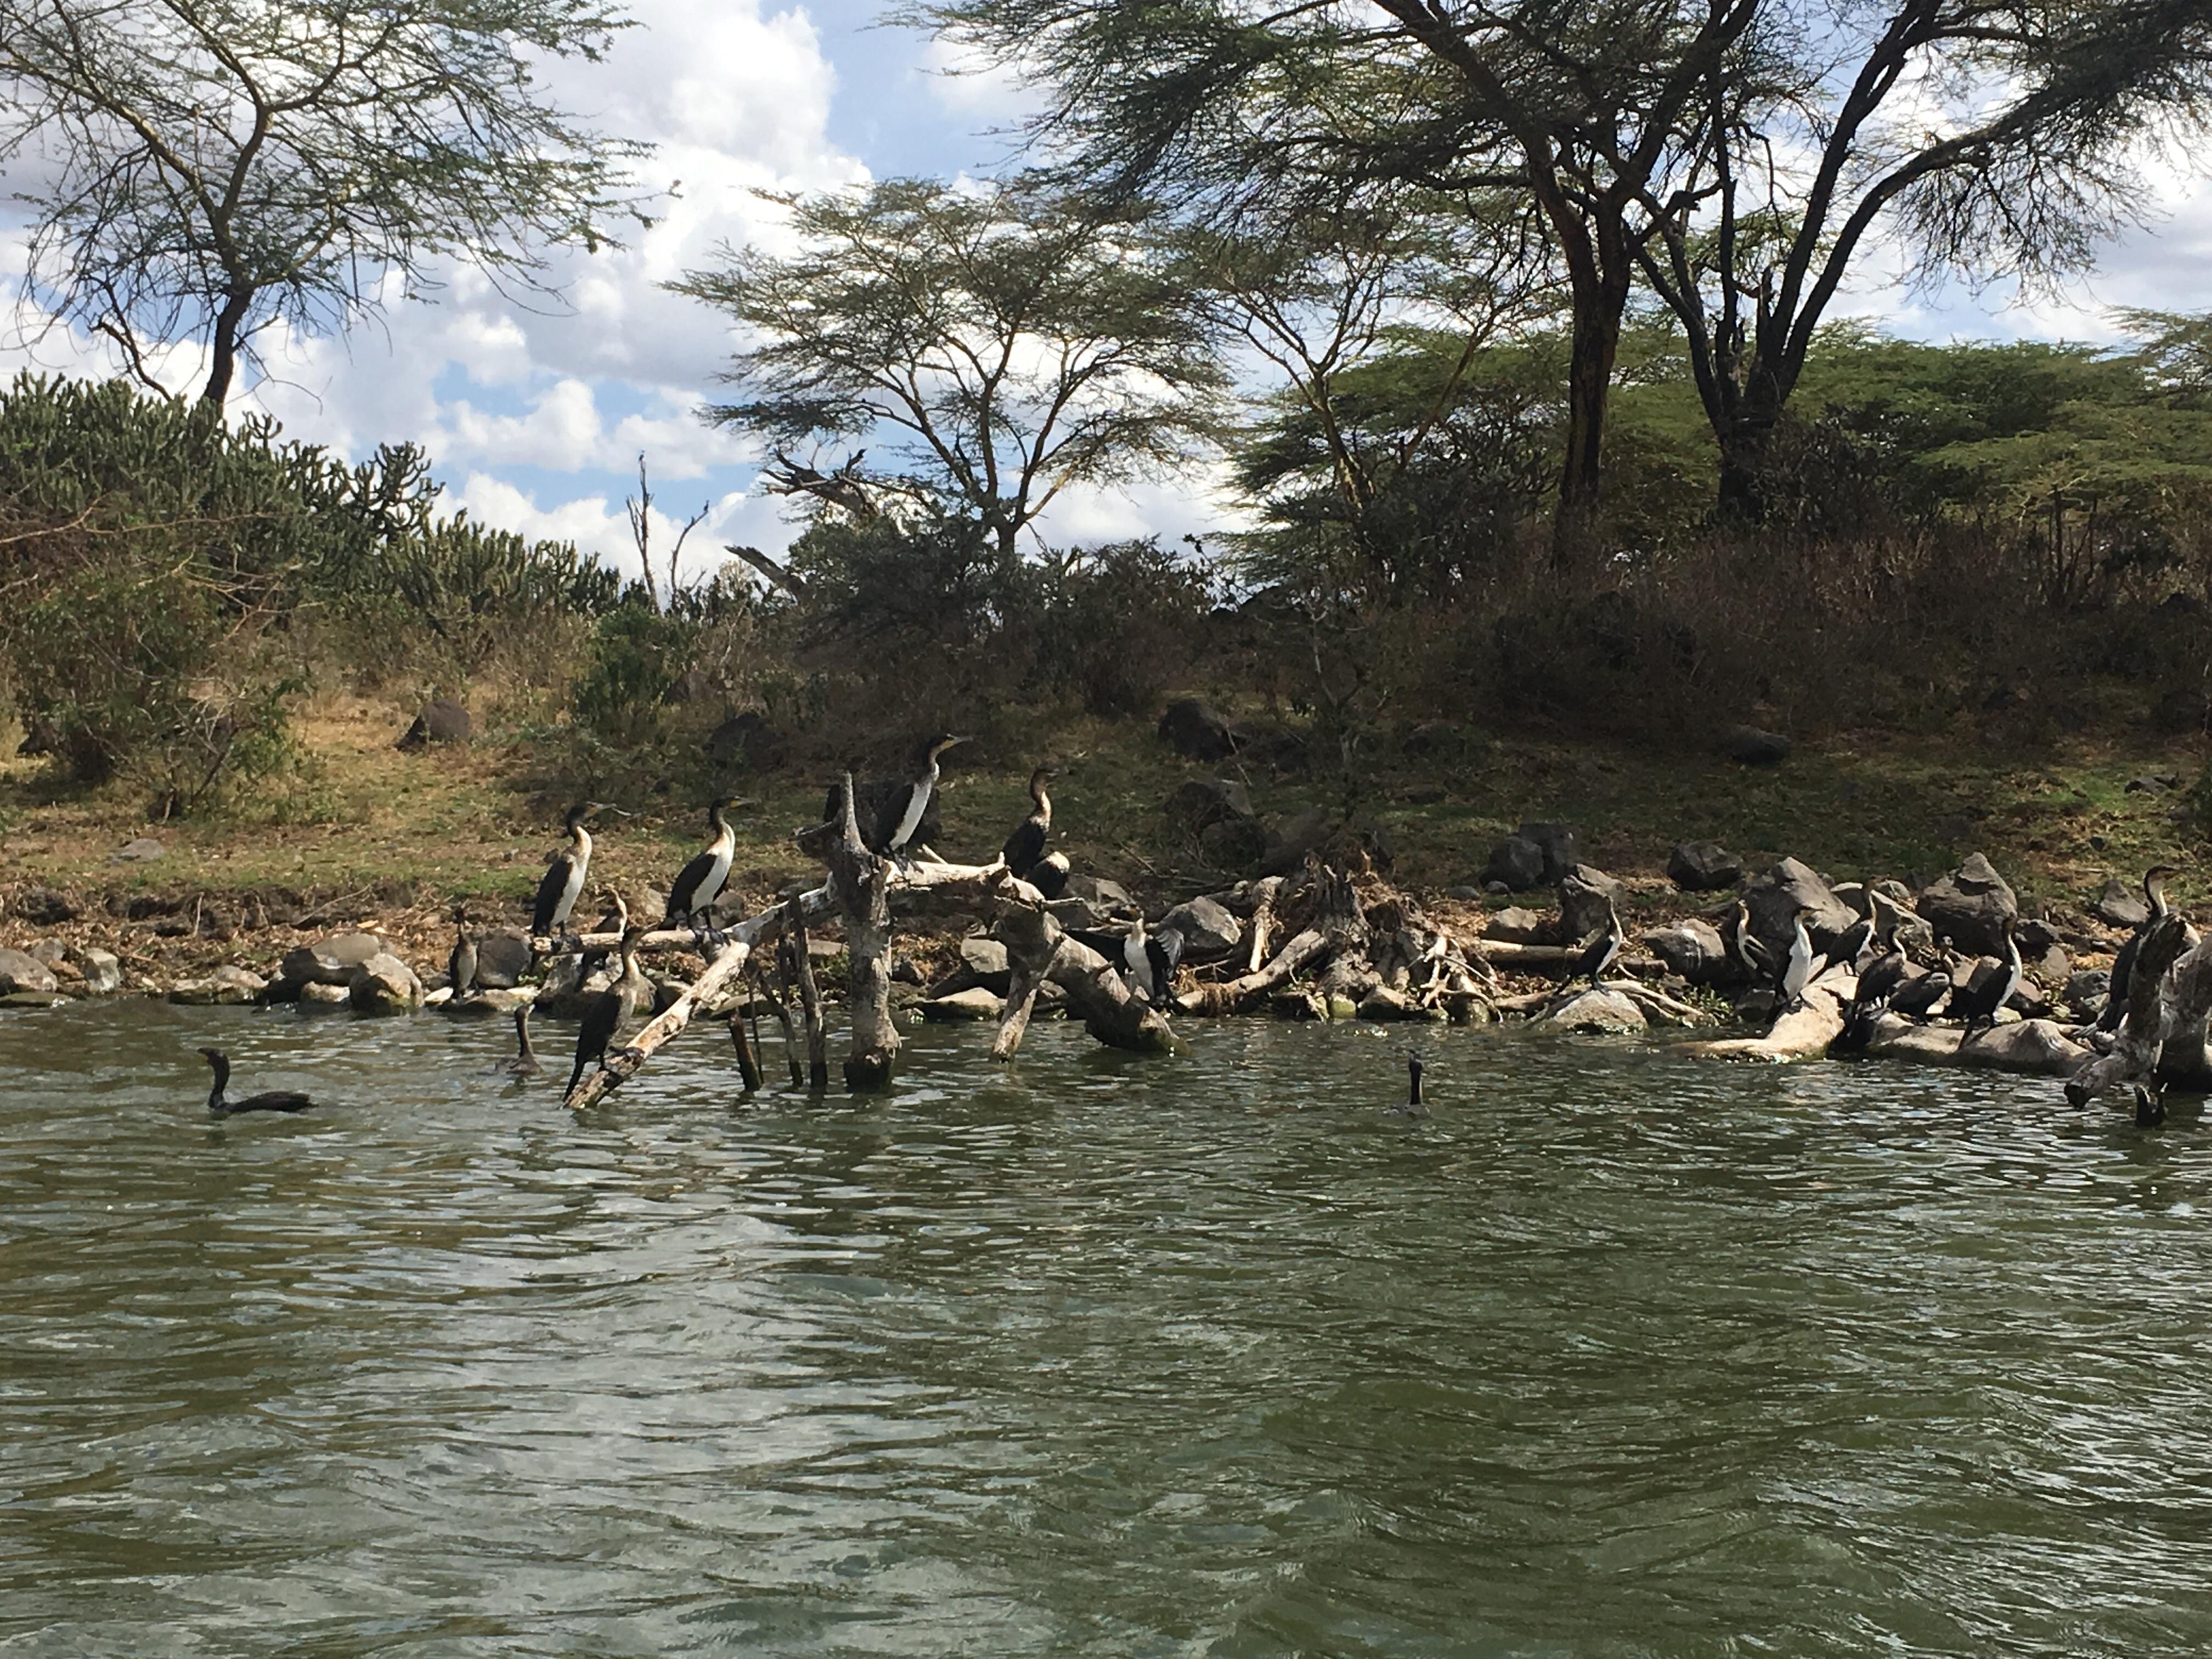 Birds gather on lake naivasha in Kenya